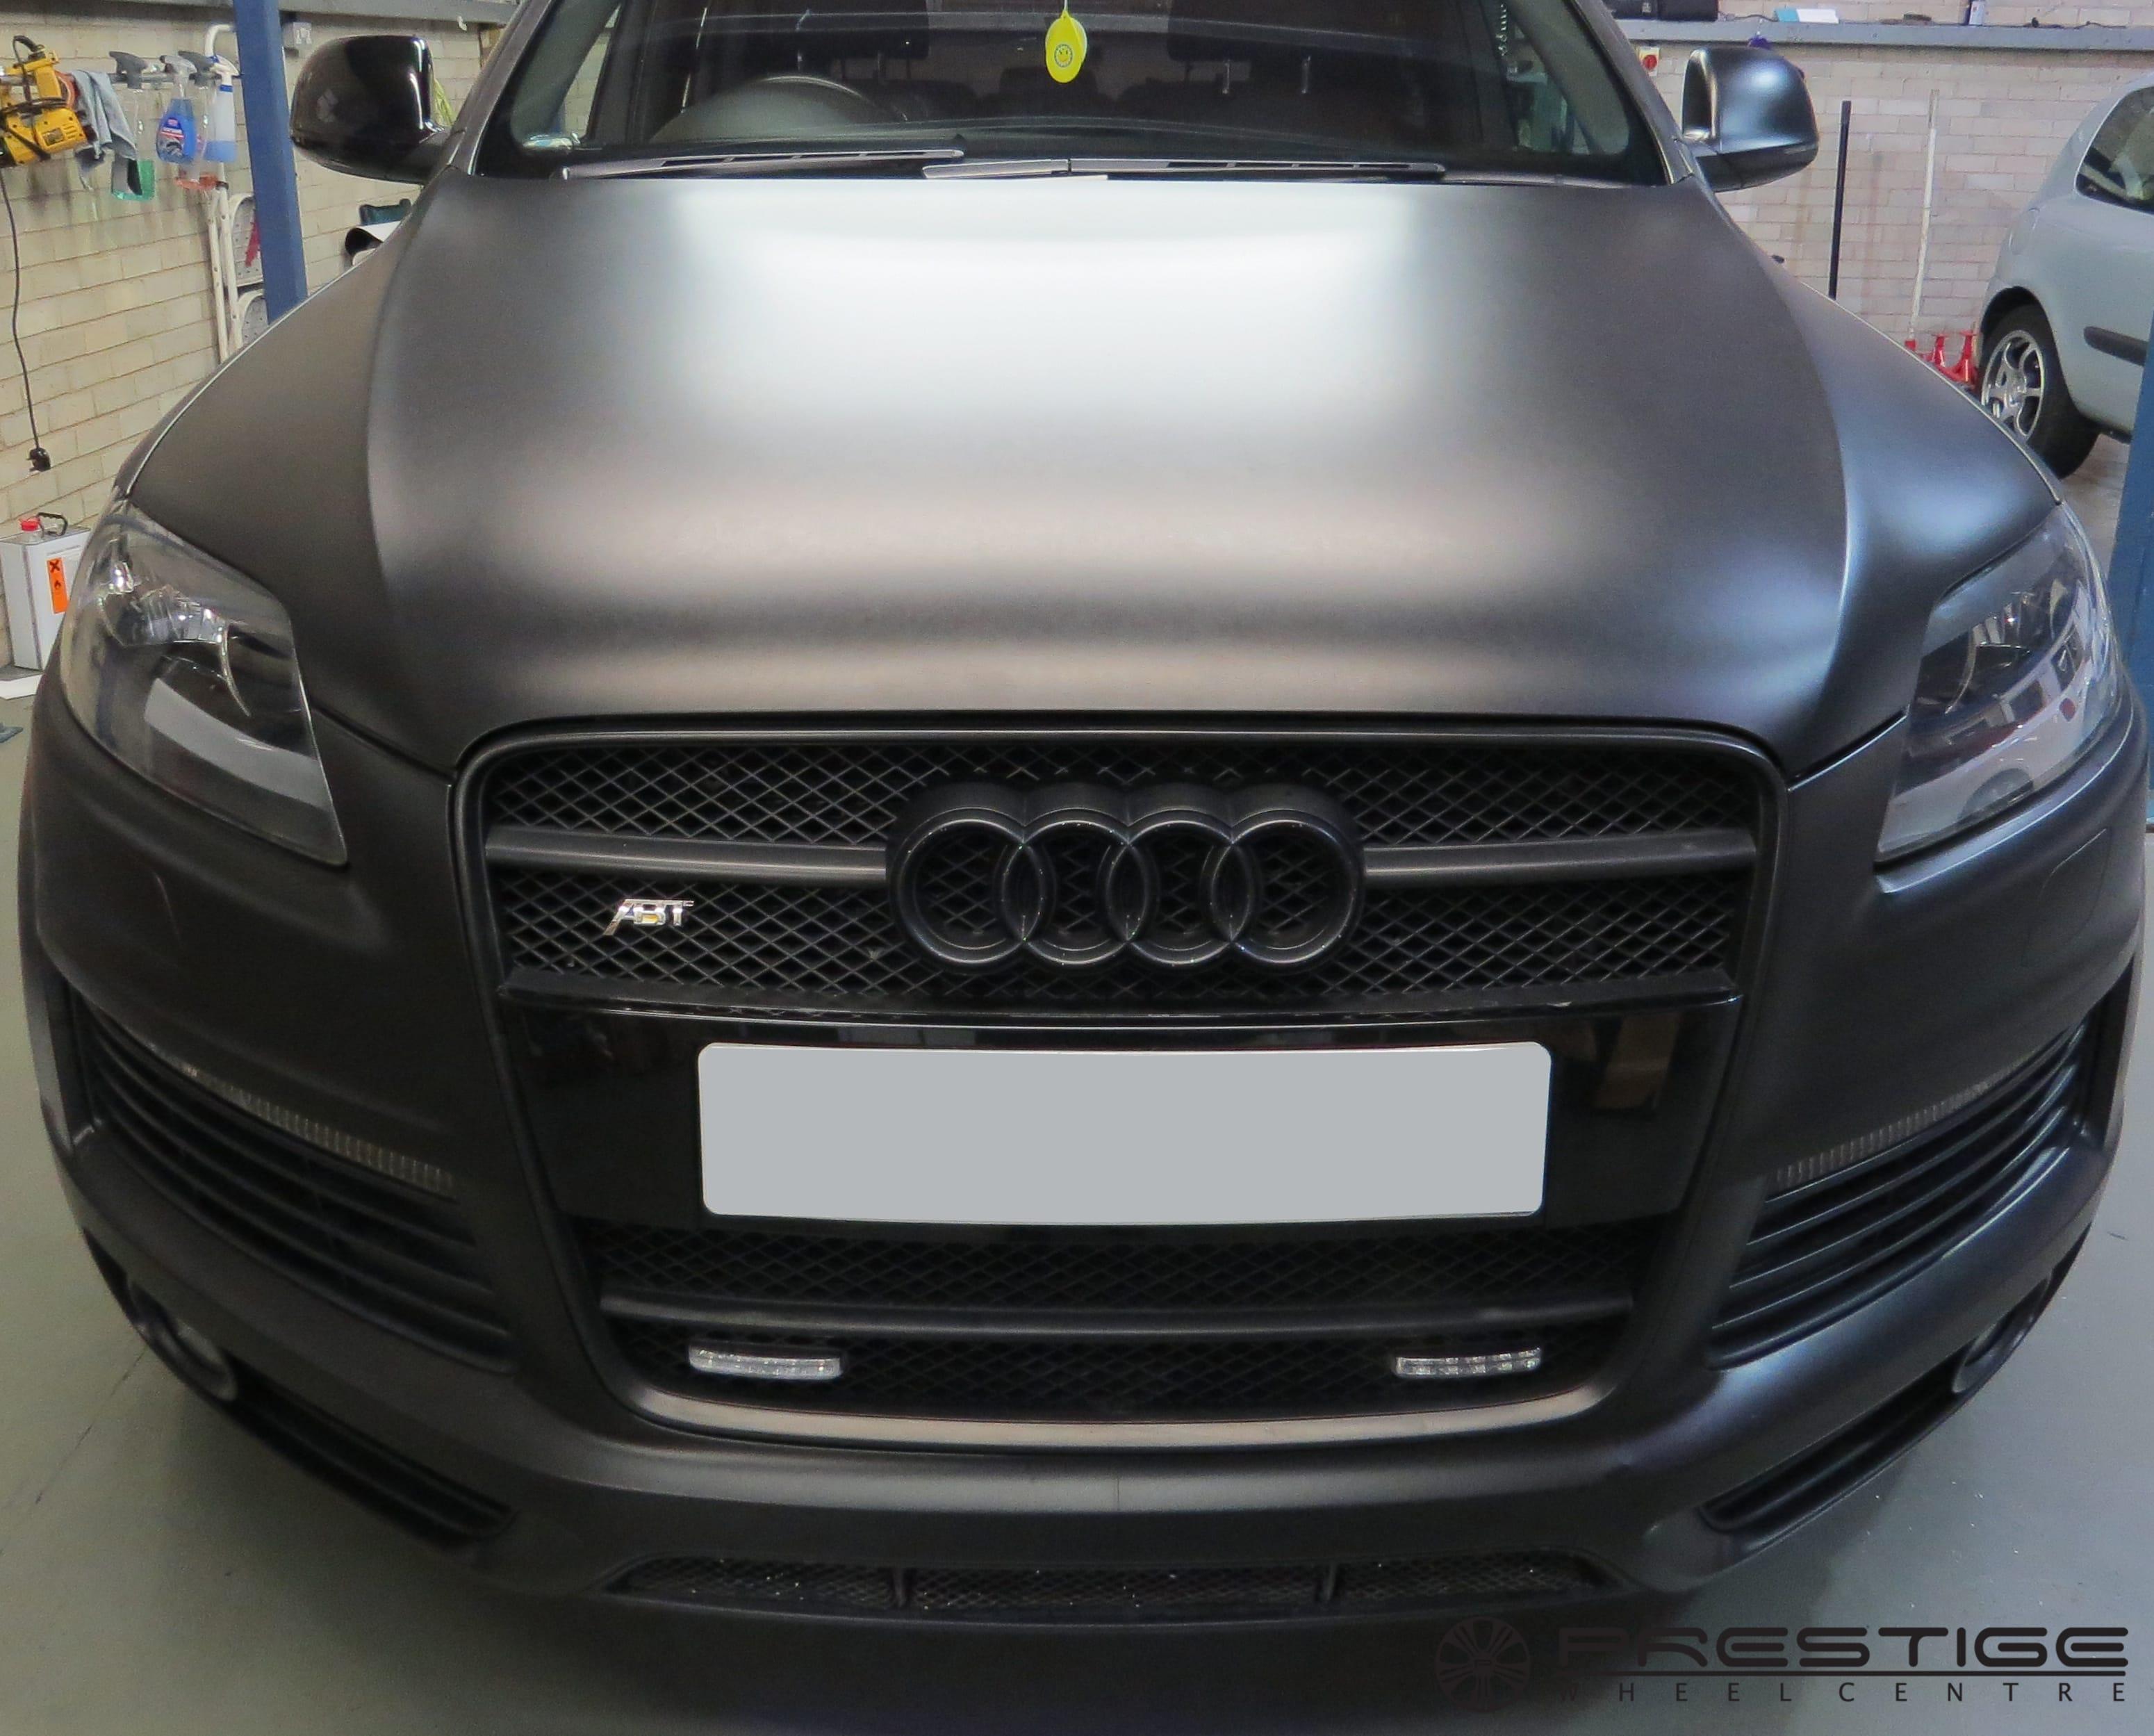 "Audi Q7 'Satin Black' vinyl wrap and new 22"" Hawke Wheels   Prestige Wheel Centre News"